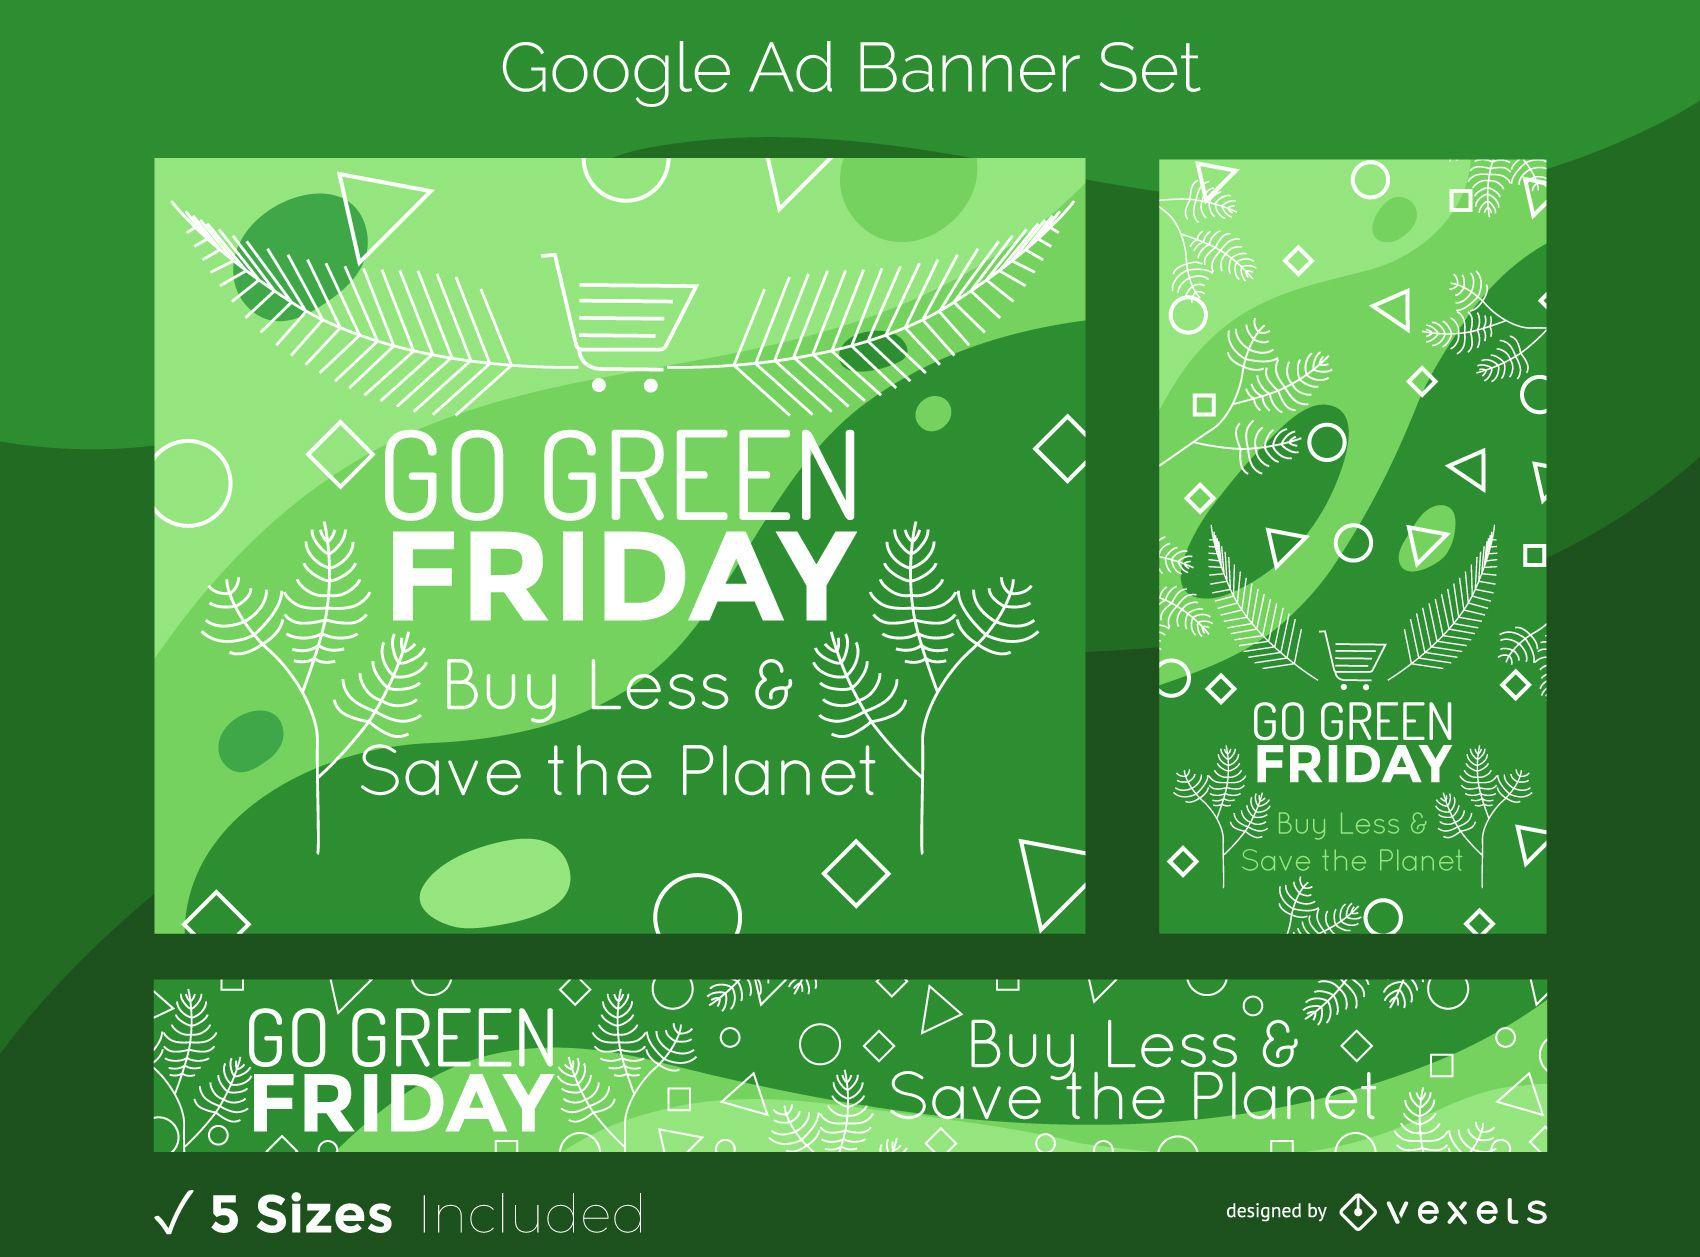 Green Friday Google Ads Banner Set